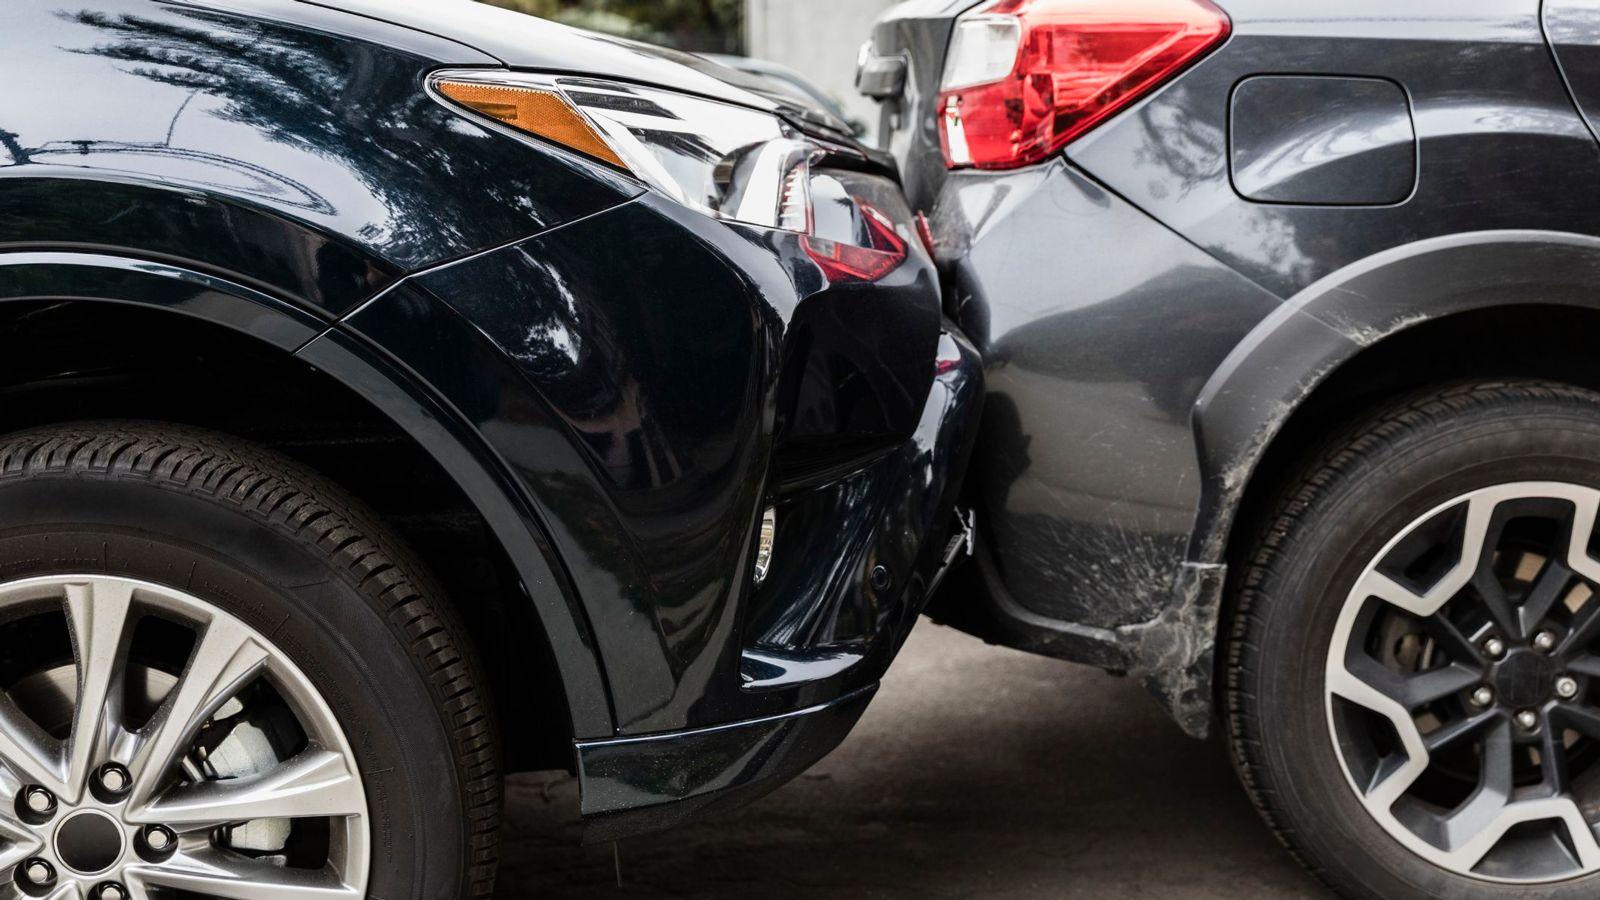 Fleeing Scene of Car Accident in Florida Matthew Konecky